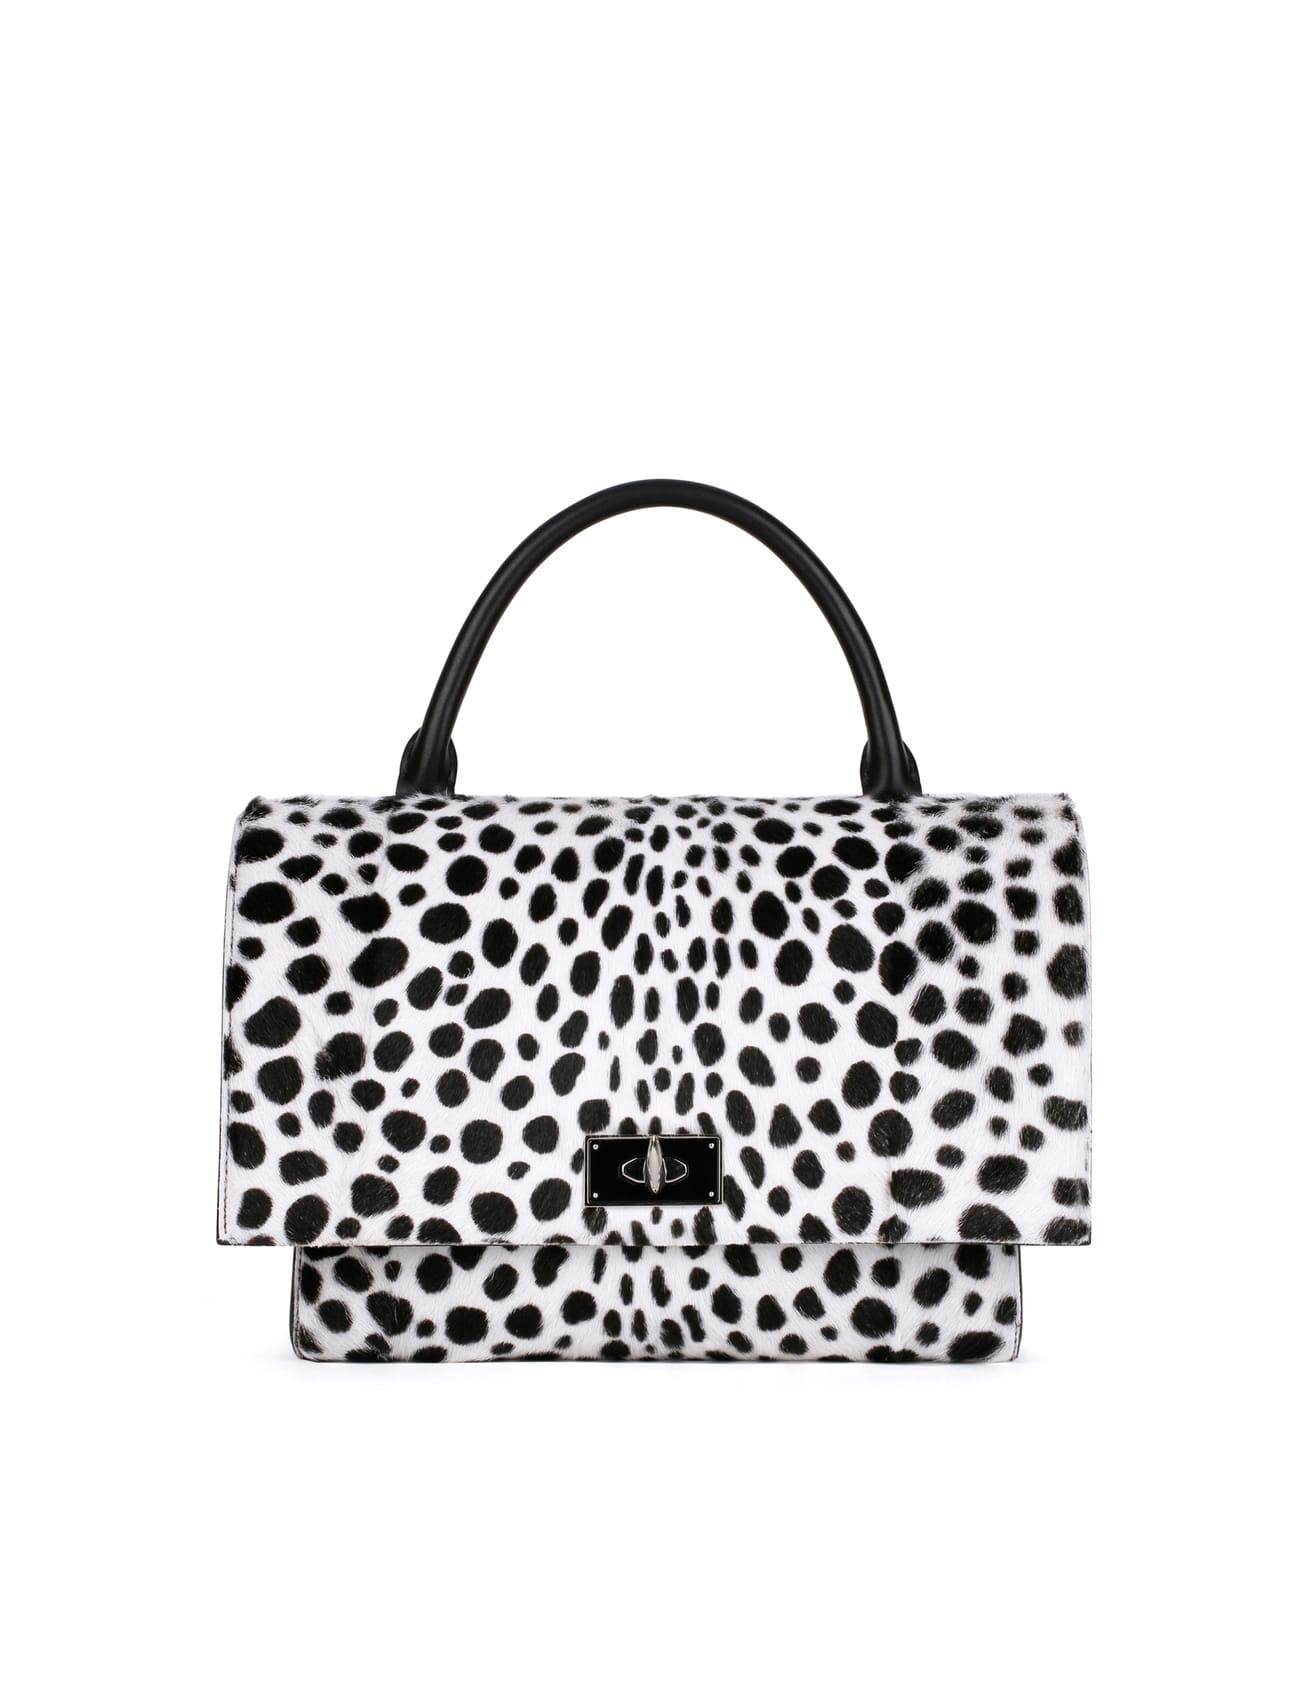 Givenchy Pre Fall 2020 Bag Collection